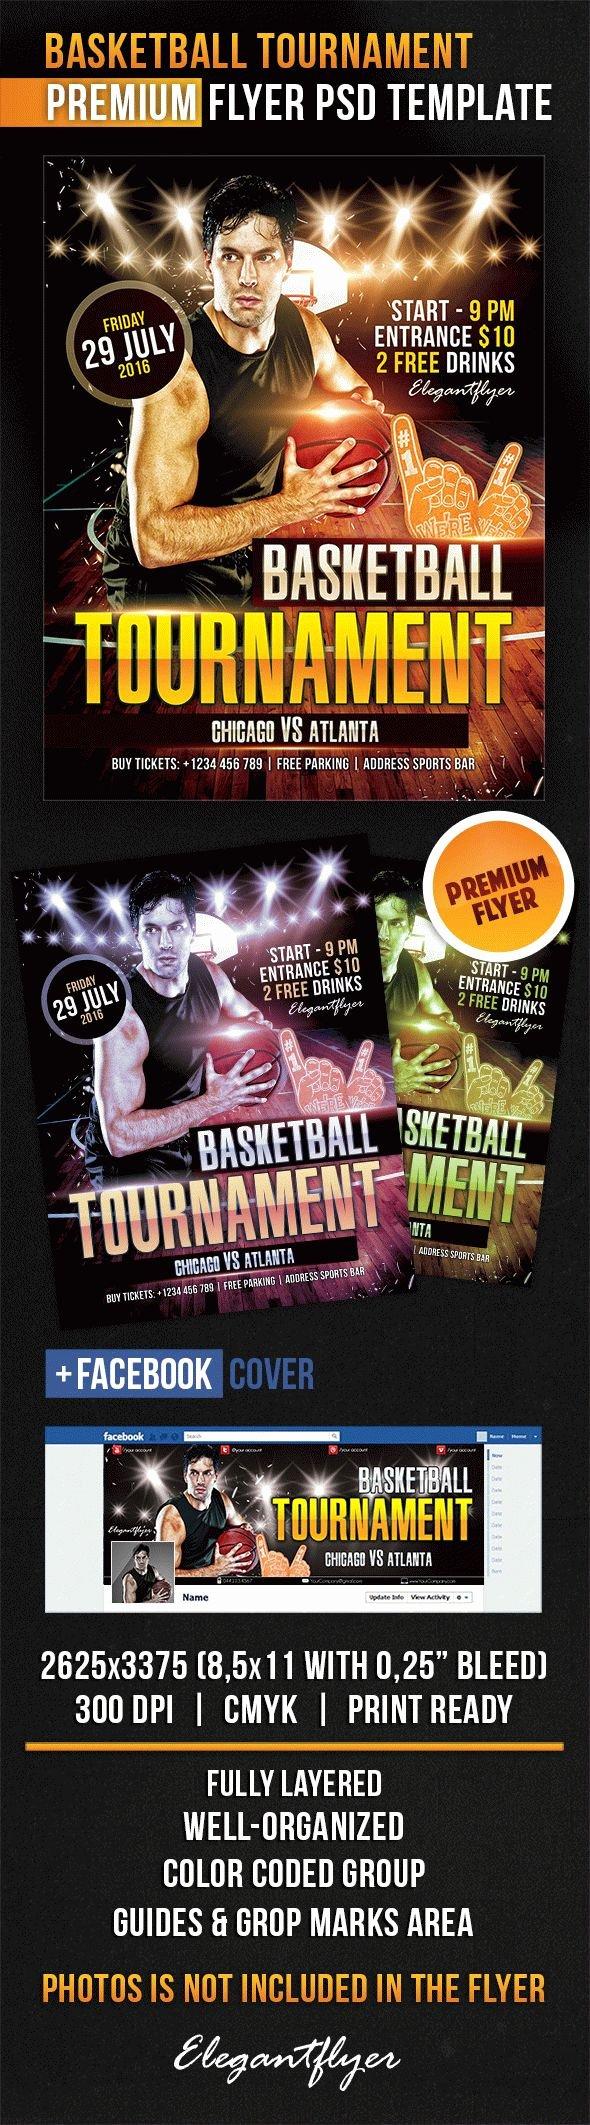 Basketball tournament Flyer Template Unique Basketball tournament – Flyer Psd Template – by Elegantflyer